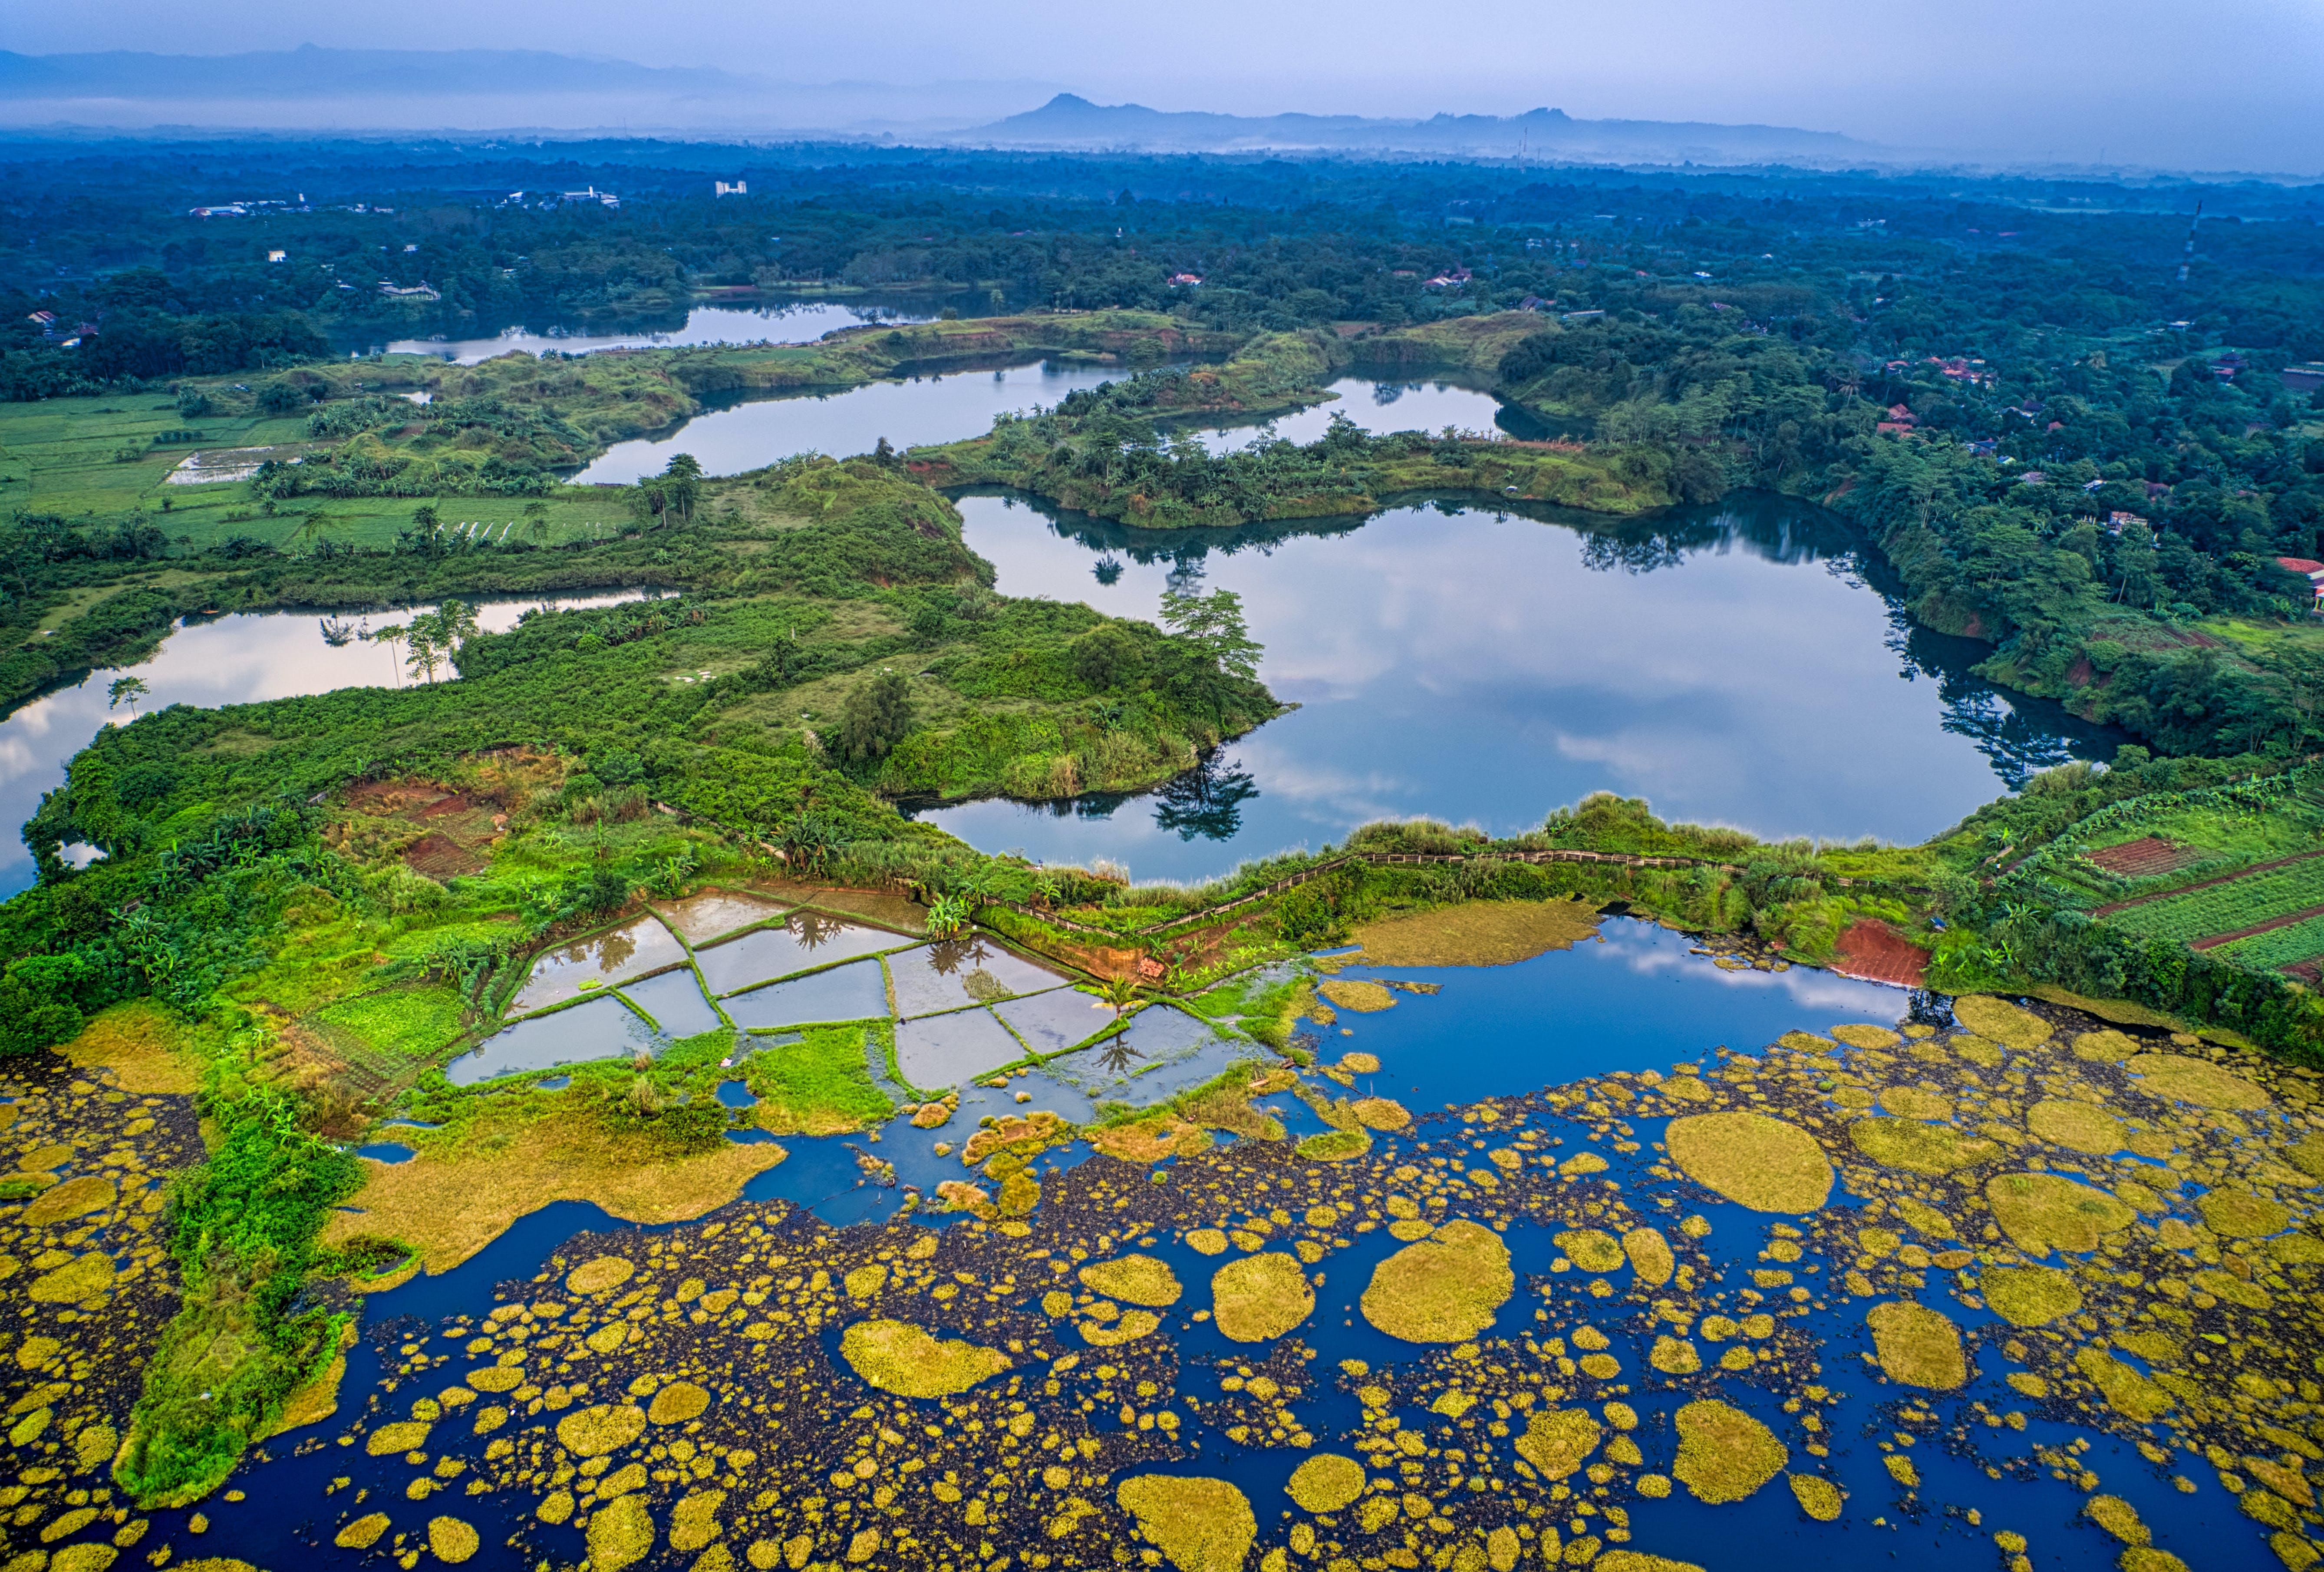 Aerial Photo of Lake